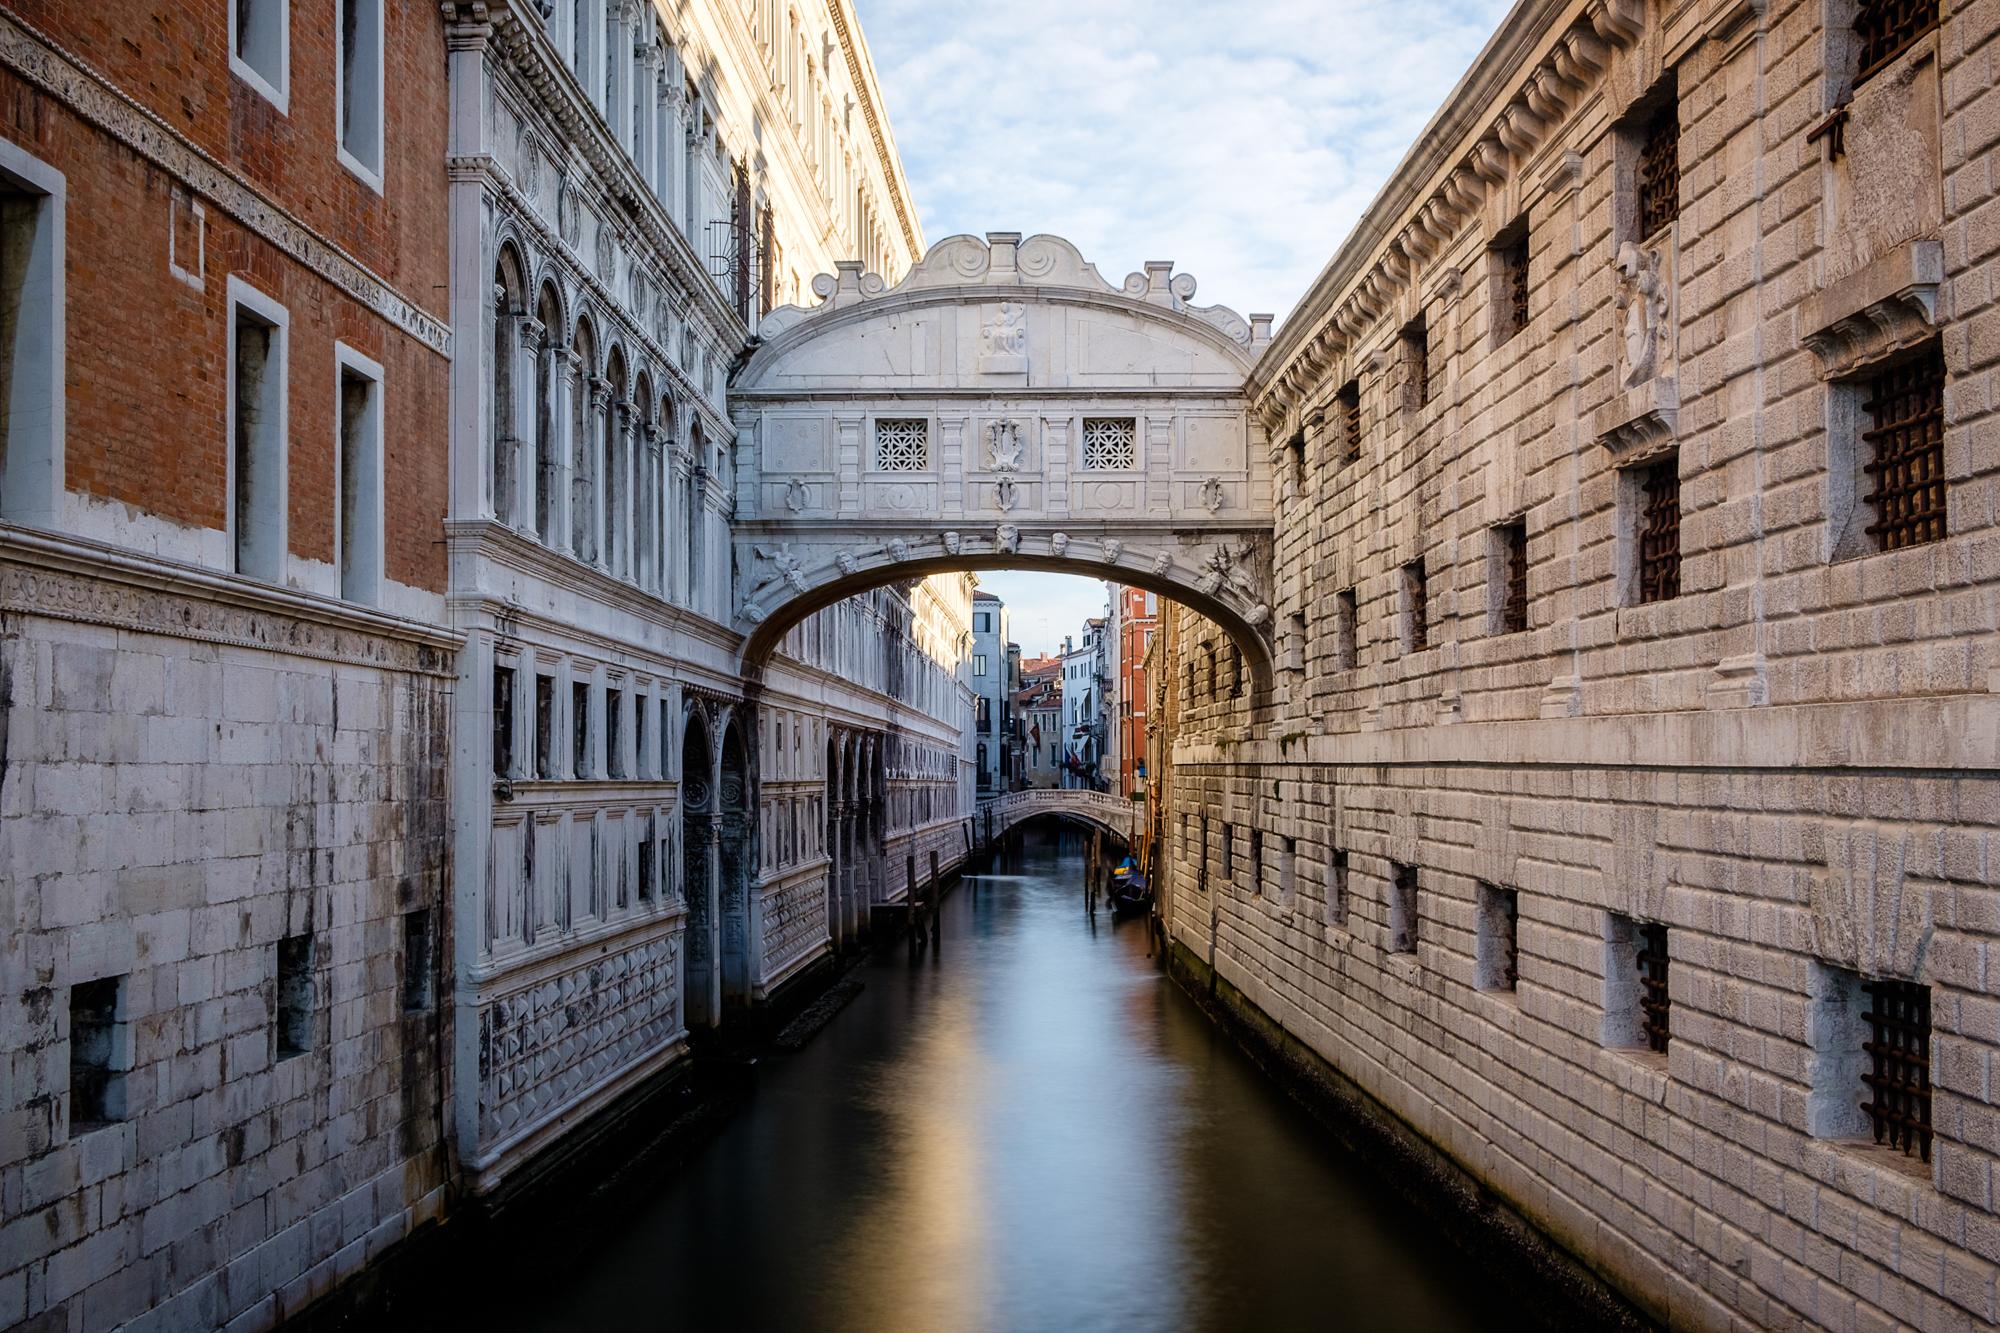 TS -170727 - Venice - 022.jpg